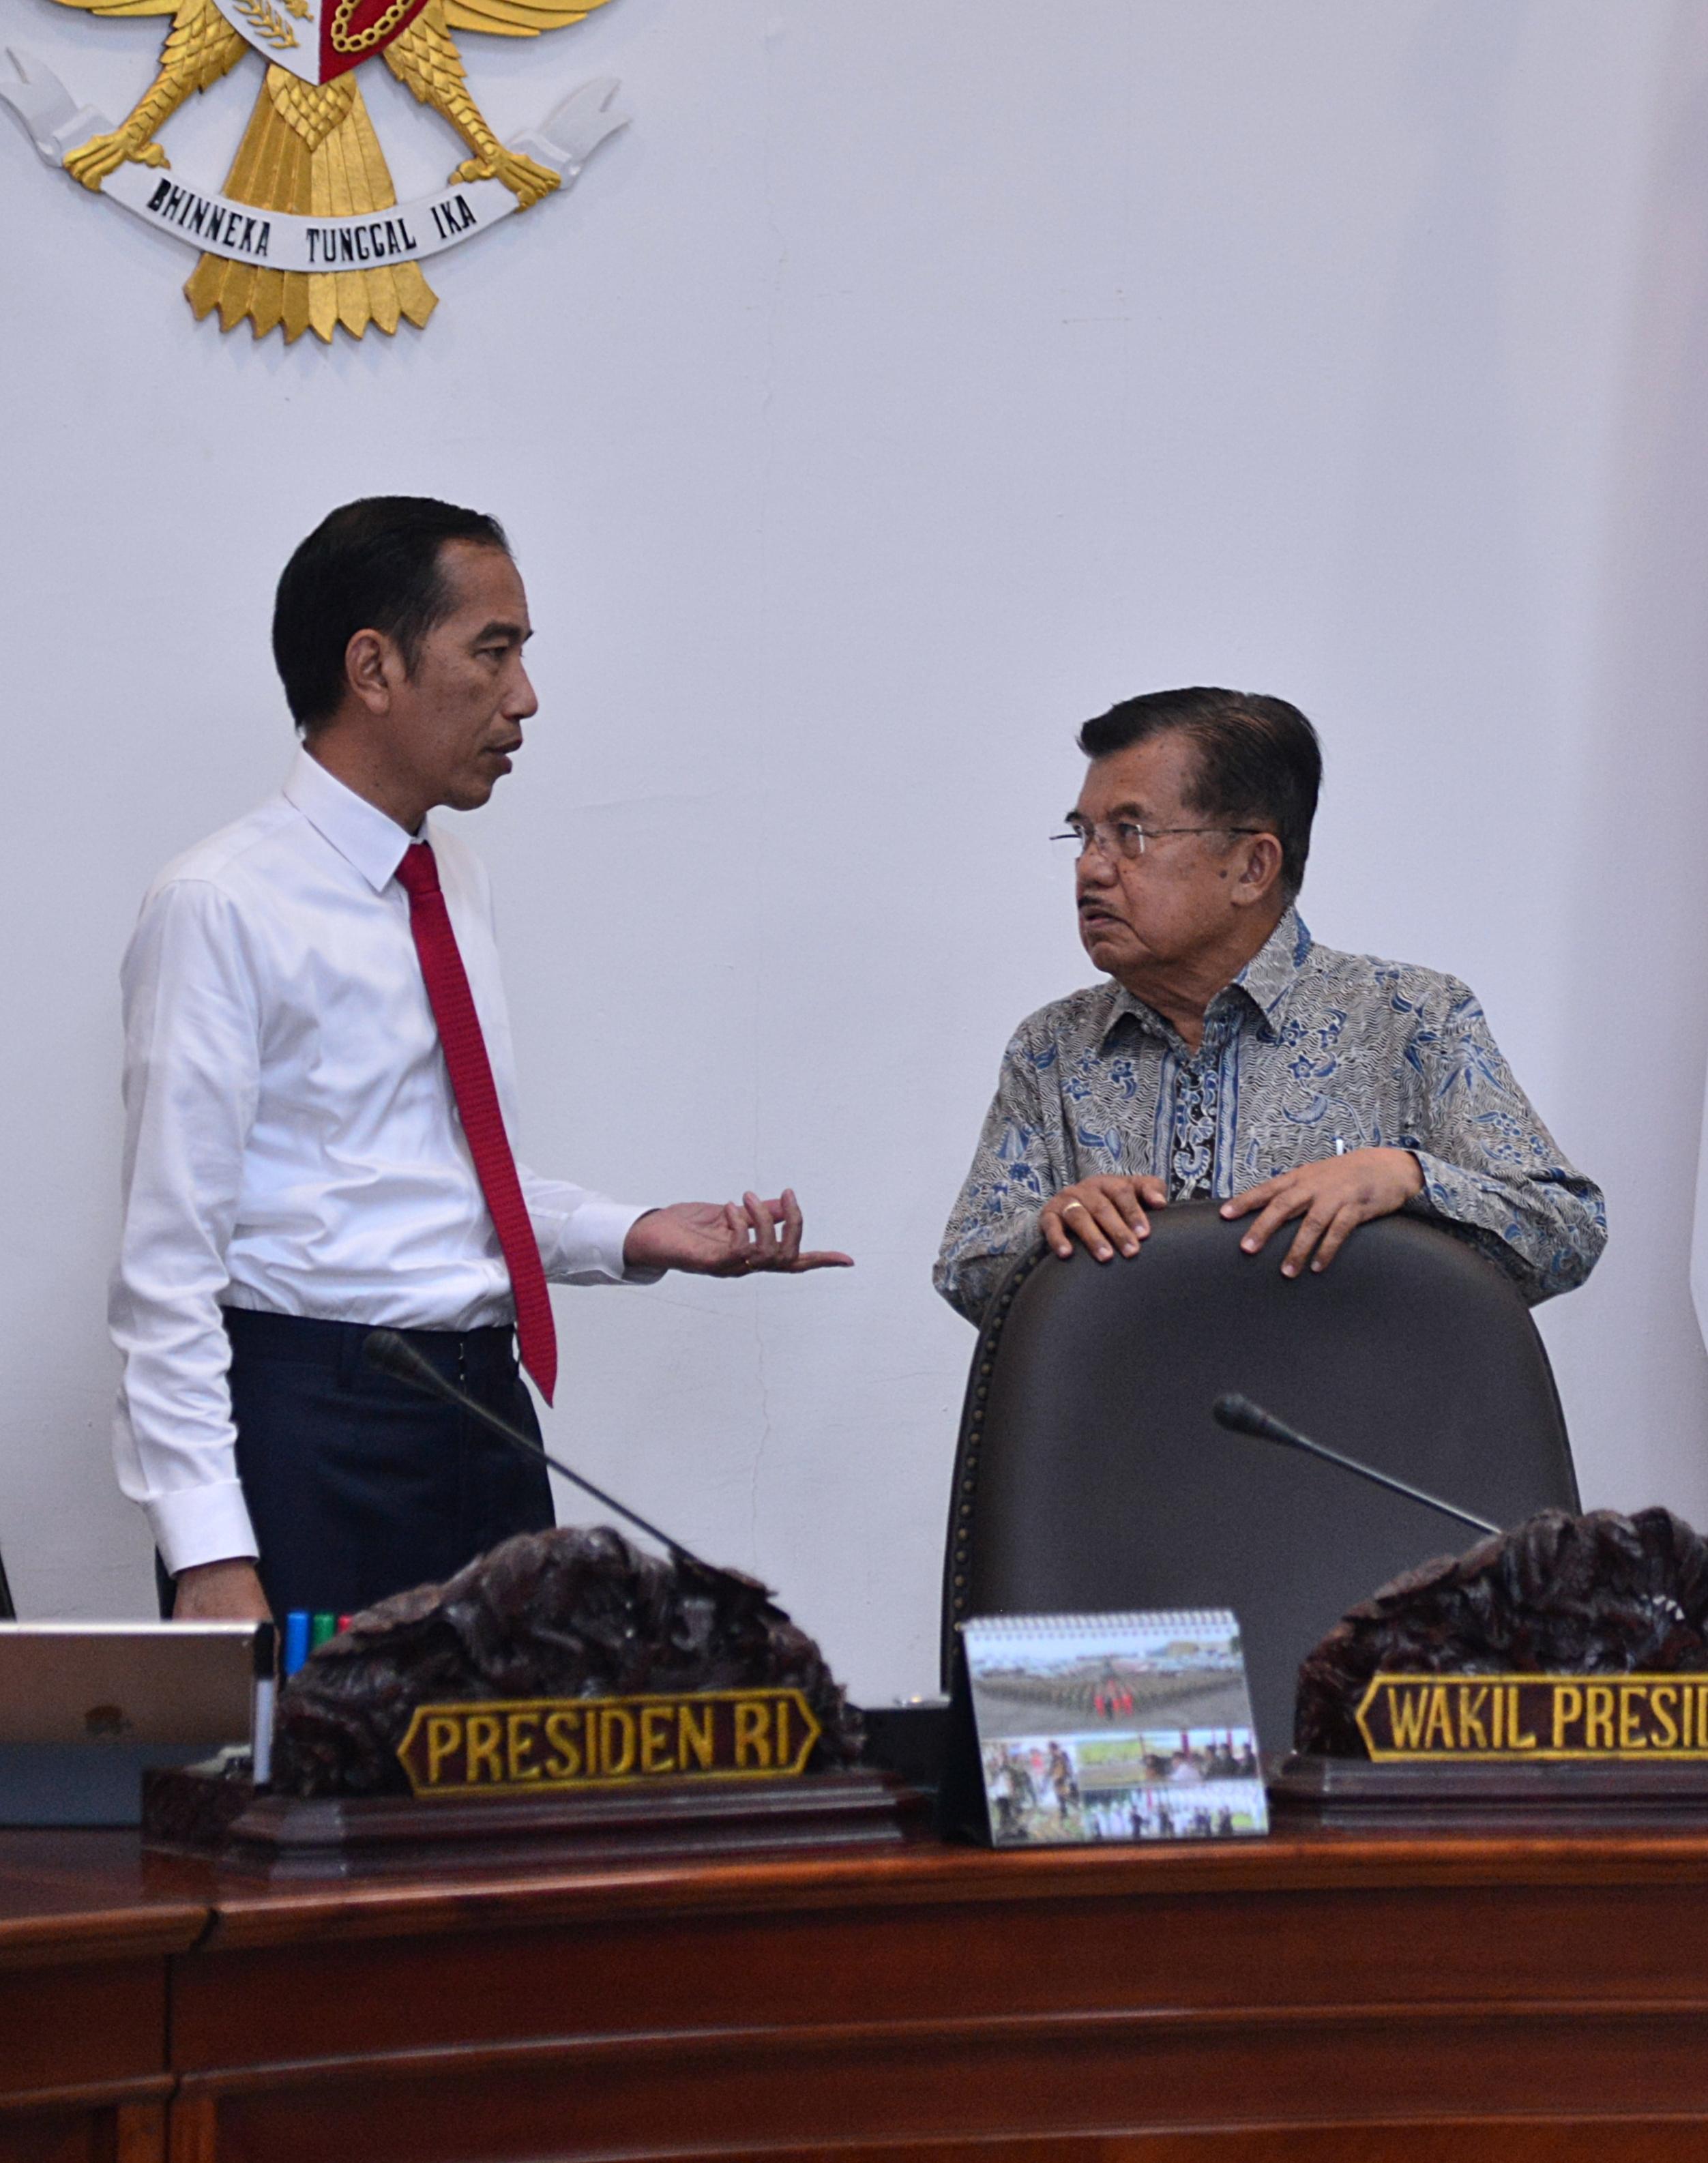 Presiden Akan Hadiri KTT ASEAN dan KTT APEC